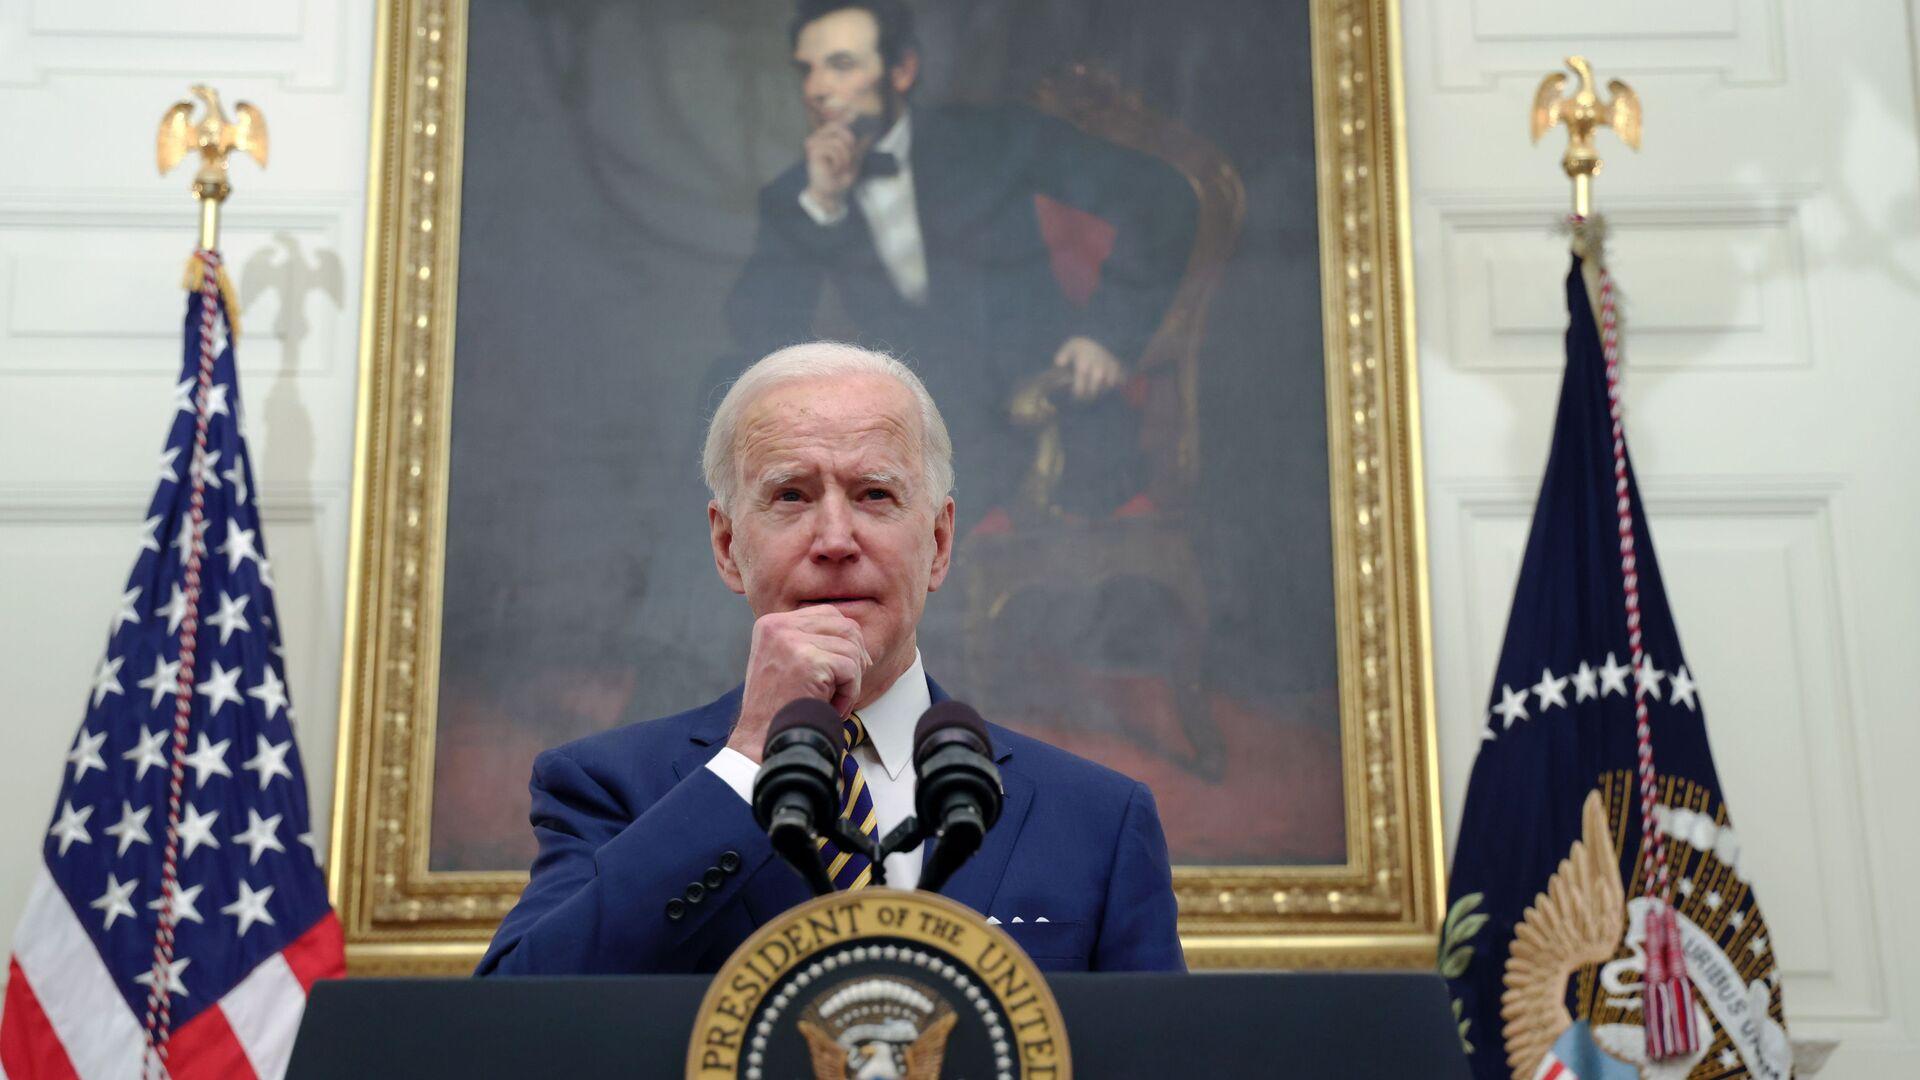 Joe Biden, presidente de EEUU  - Sputnik Mundo, 1920, 05.03.2021